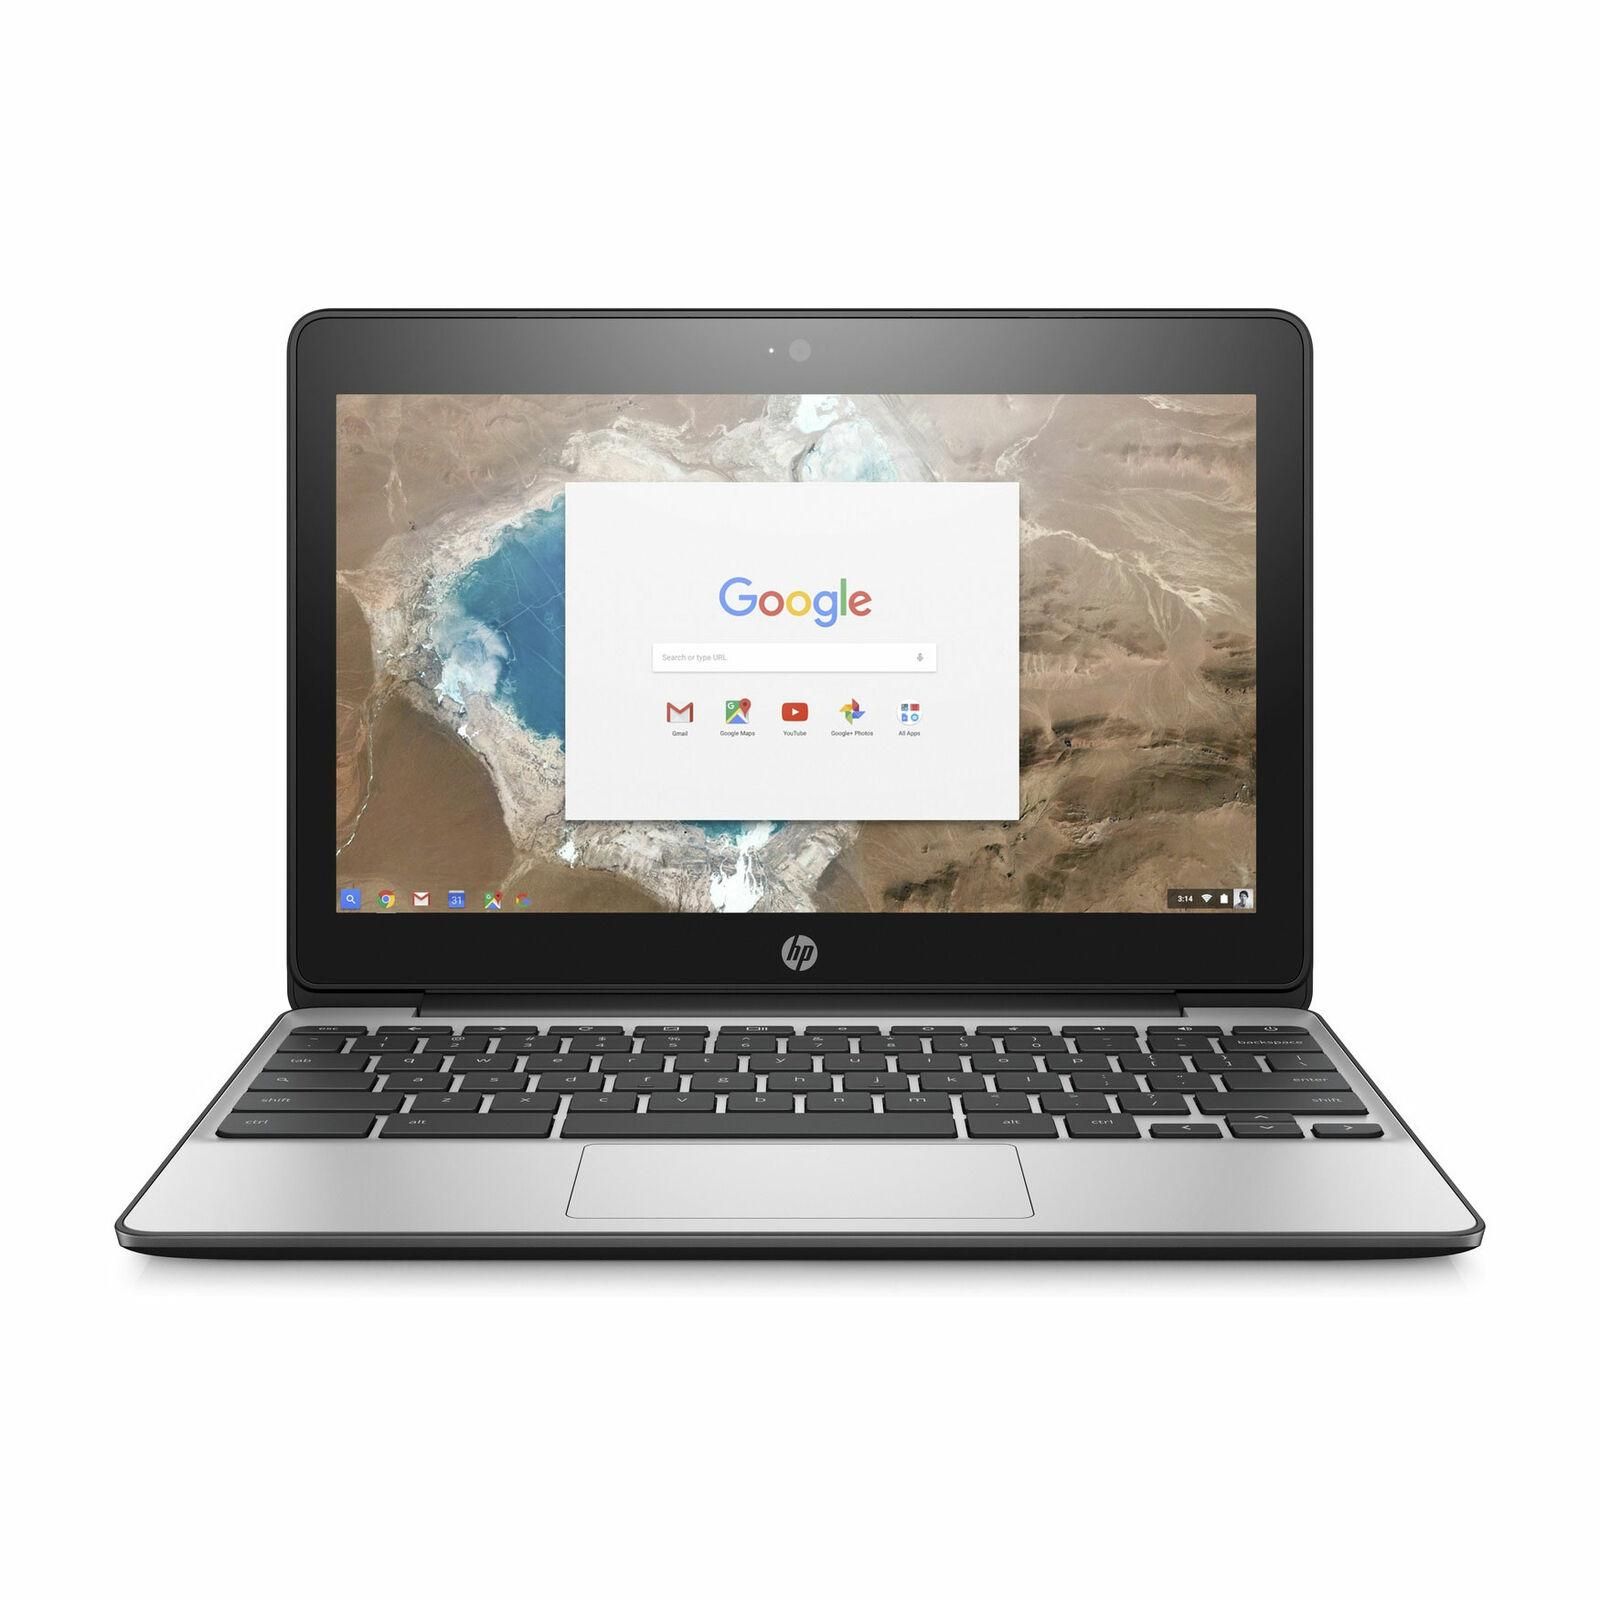 "HP Chromebook 11 G5 11.6"" Touchscreen Laptop N3060 / 4GB RAM / 16GB £171.99 @ eBay / laptopoutletdirect"